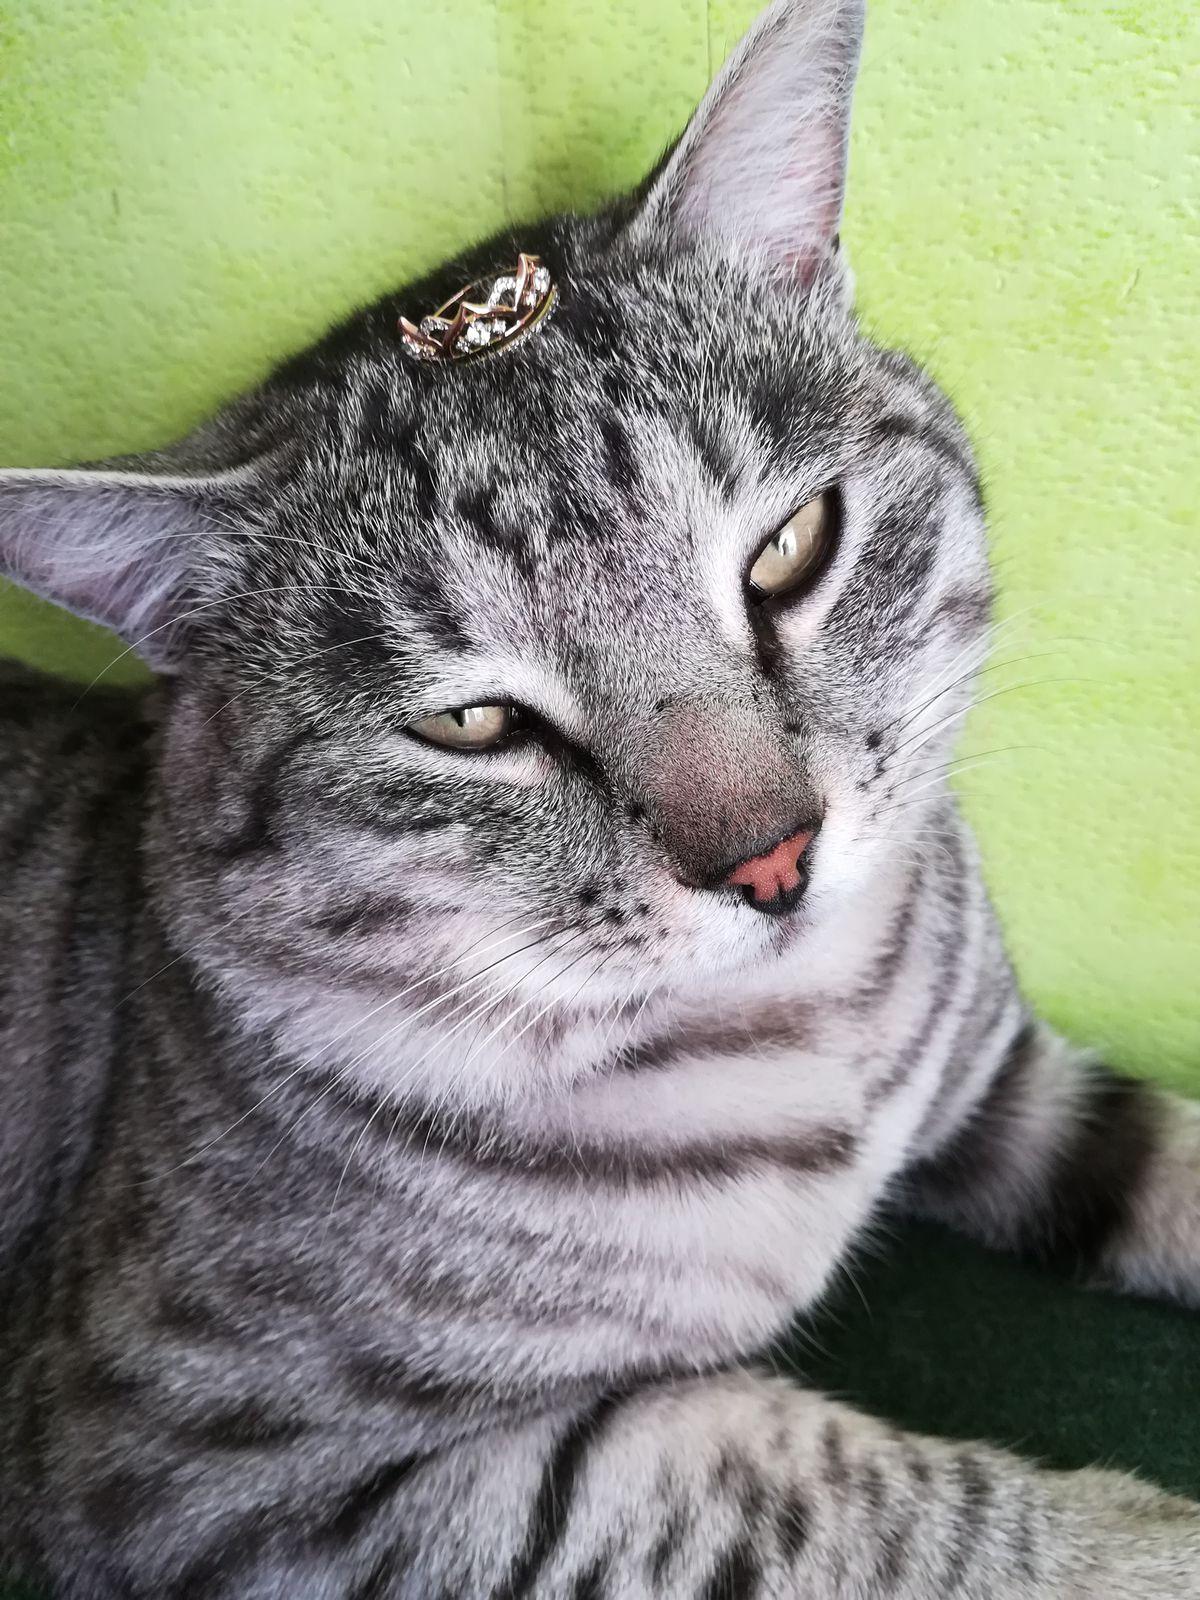 21.11.17г Колечко корона, мечта...